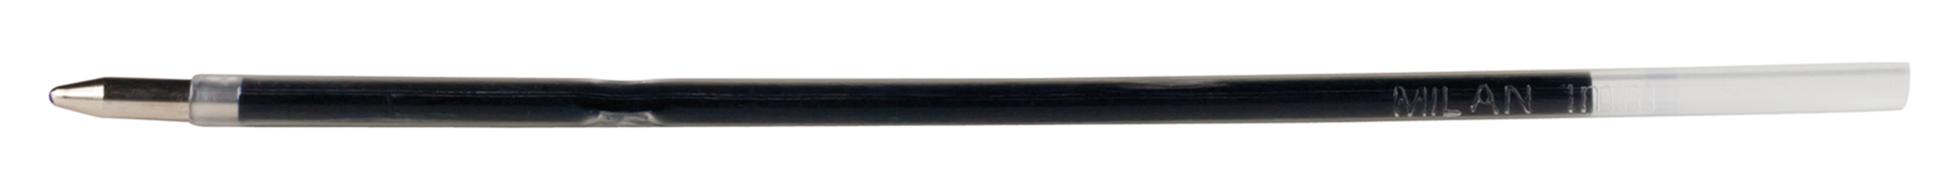 @Стержень шариковый FINE-LINE 0,7мм, синий